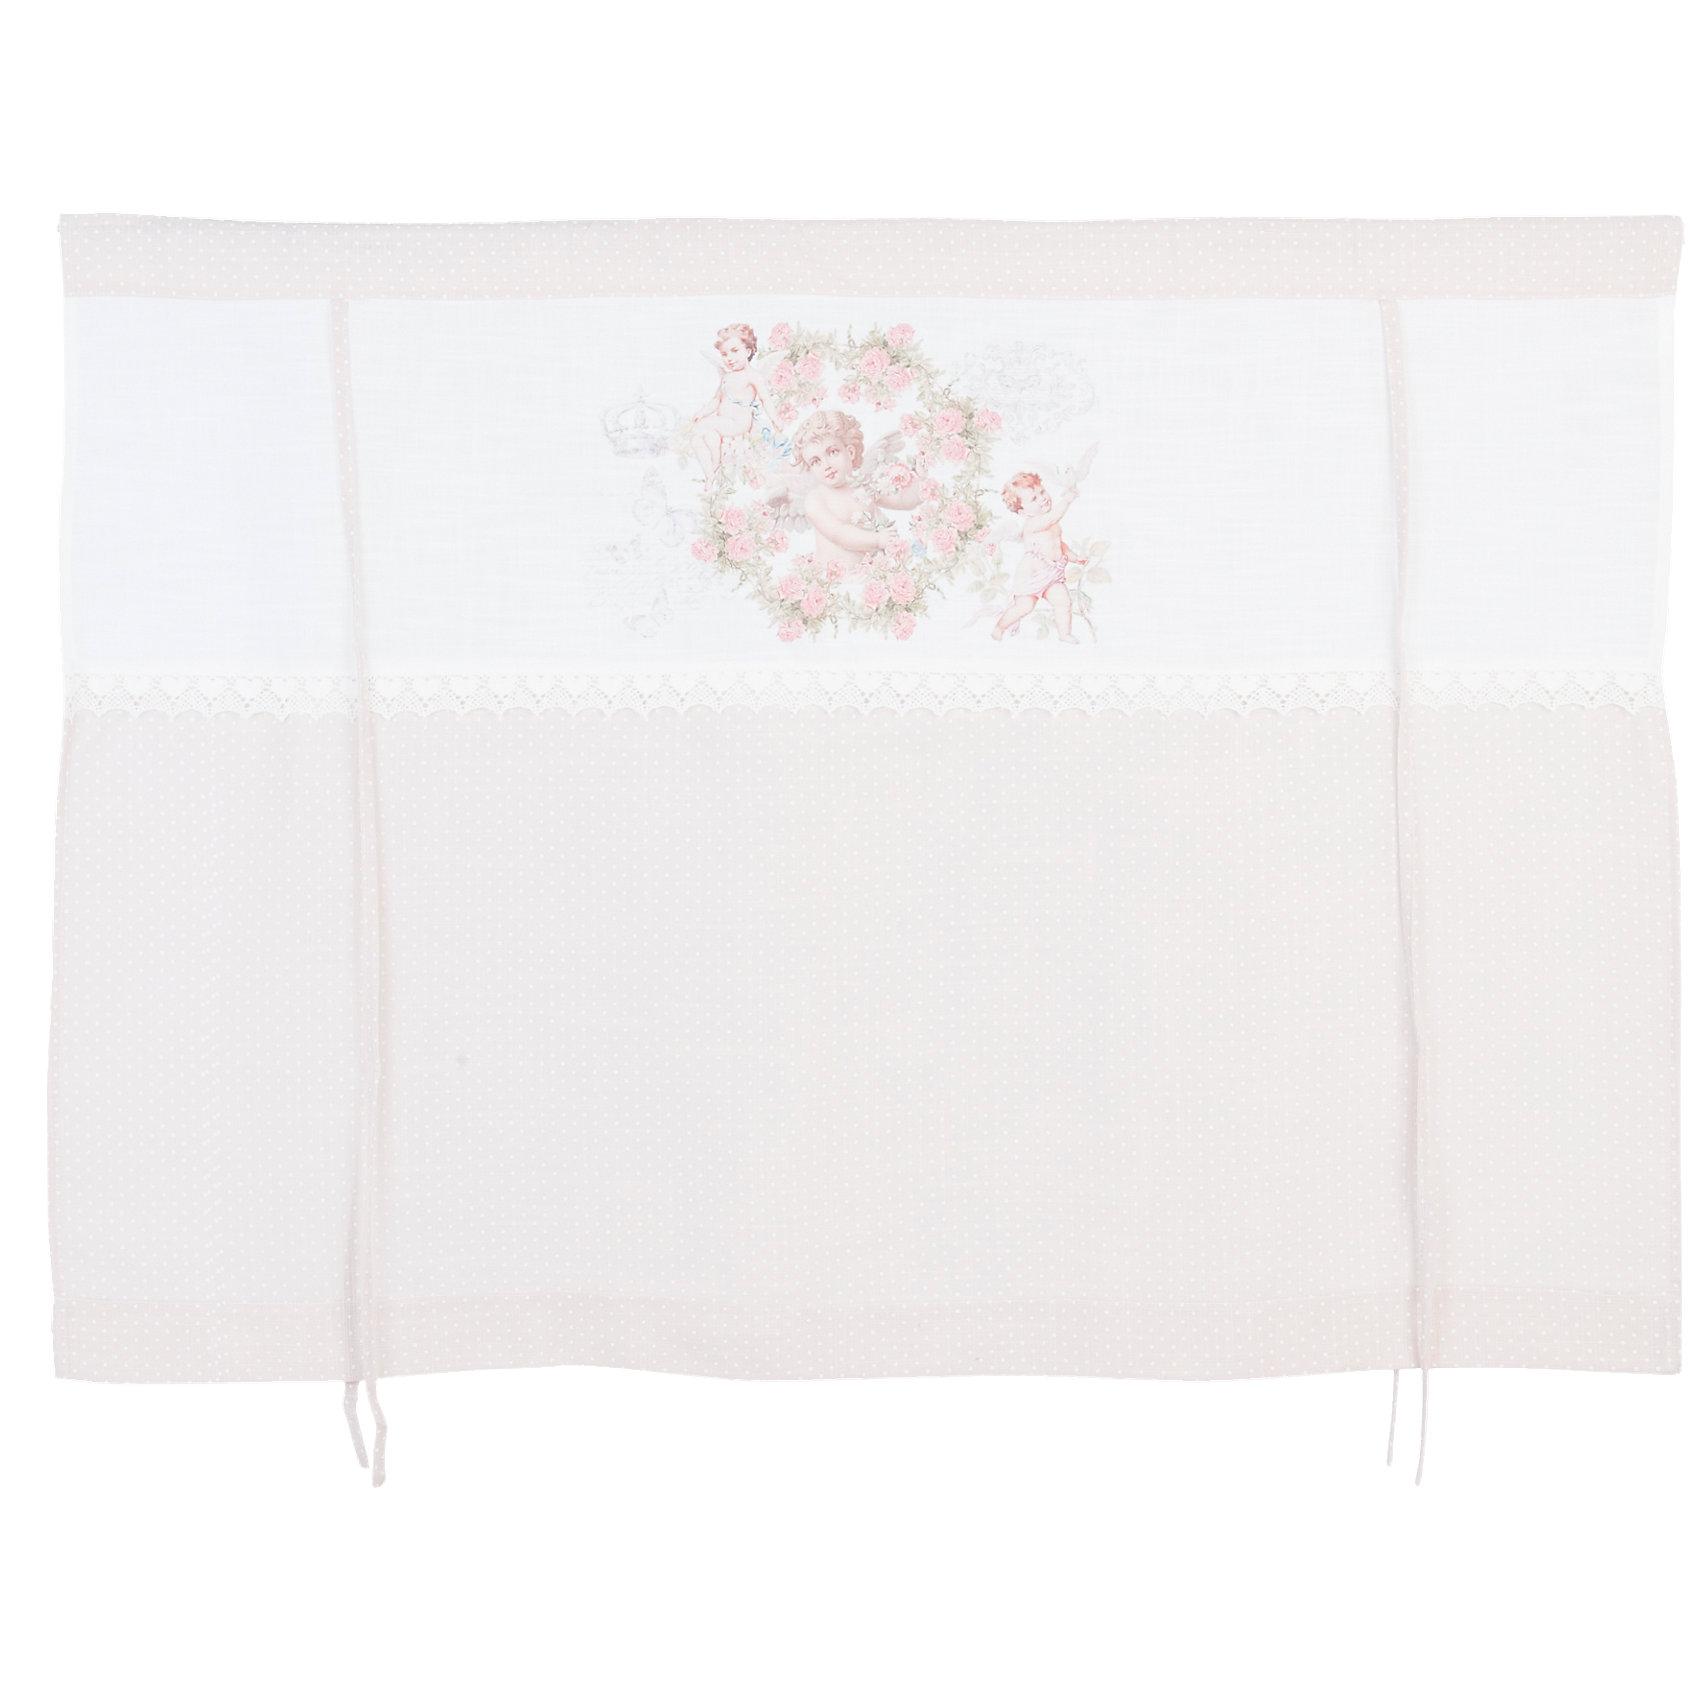 neu clayre eef raff rollo elin 120x90 cm beige kombi 6649219 ebay. Black Bedroom Furniture Sets. Home Design Ideas